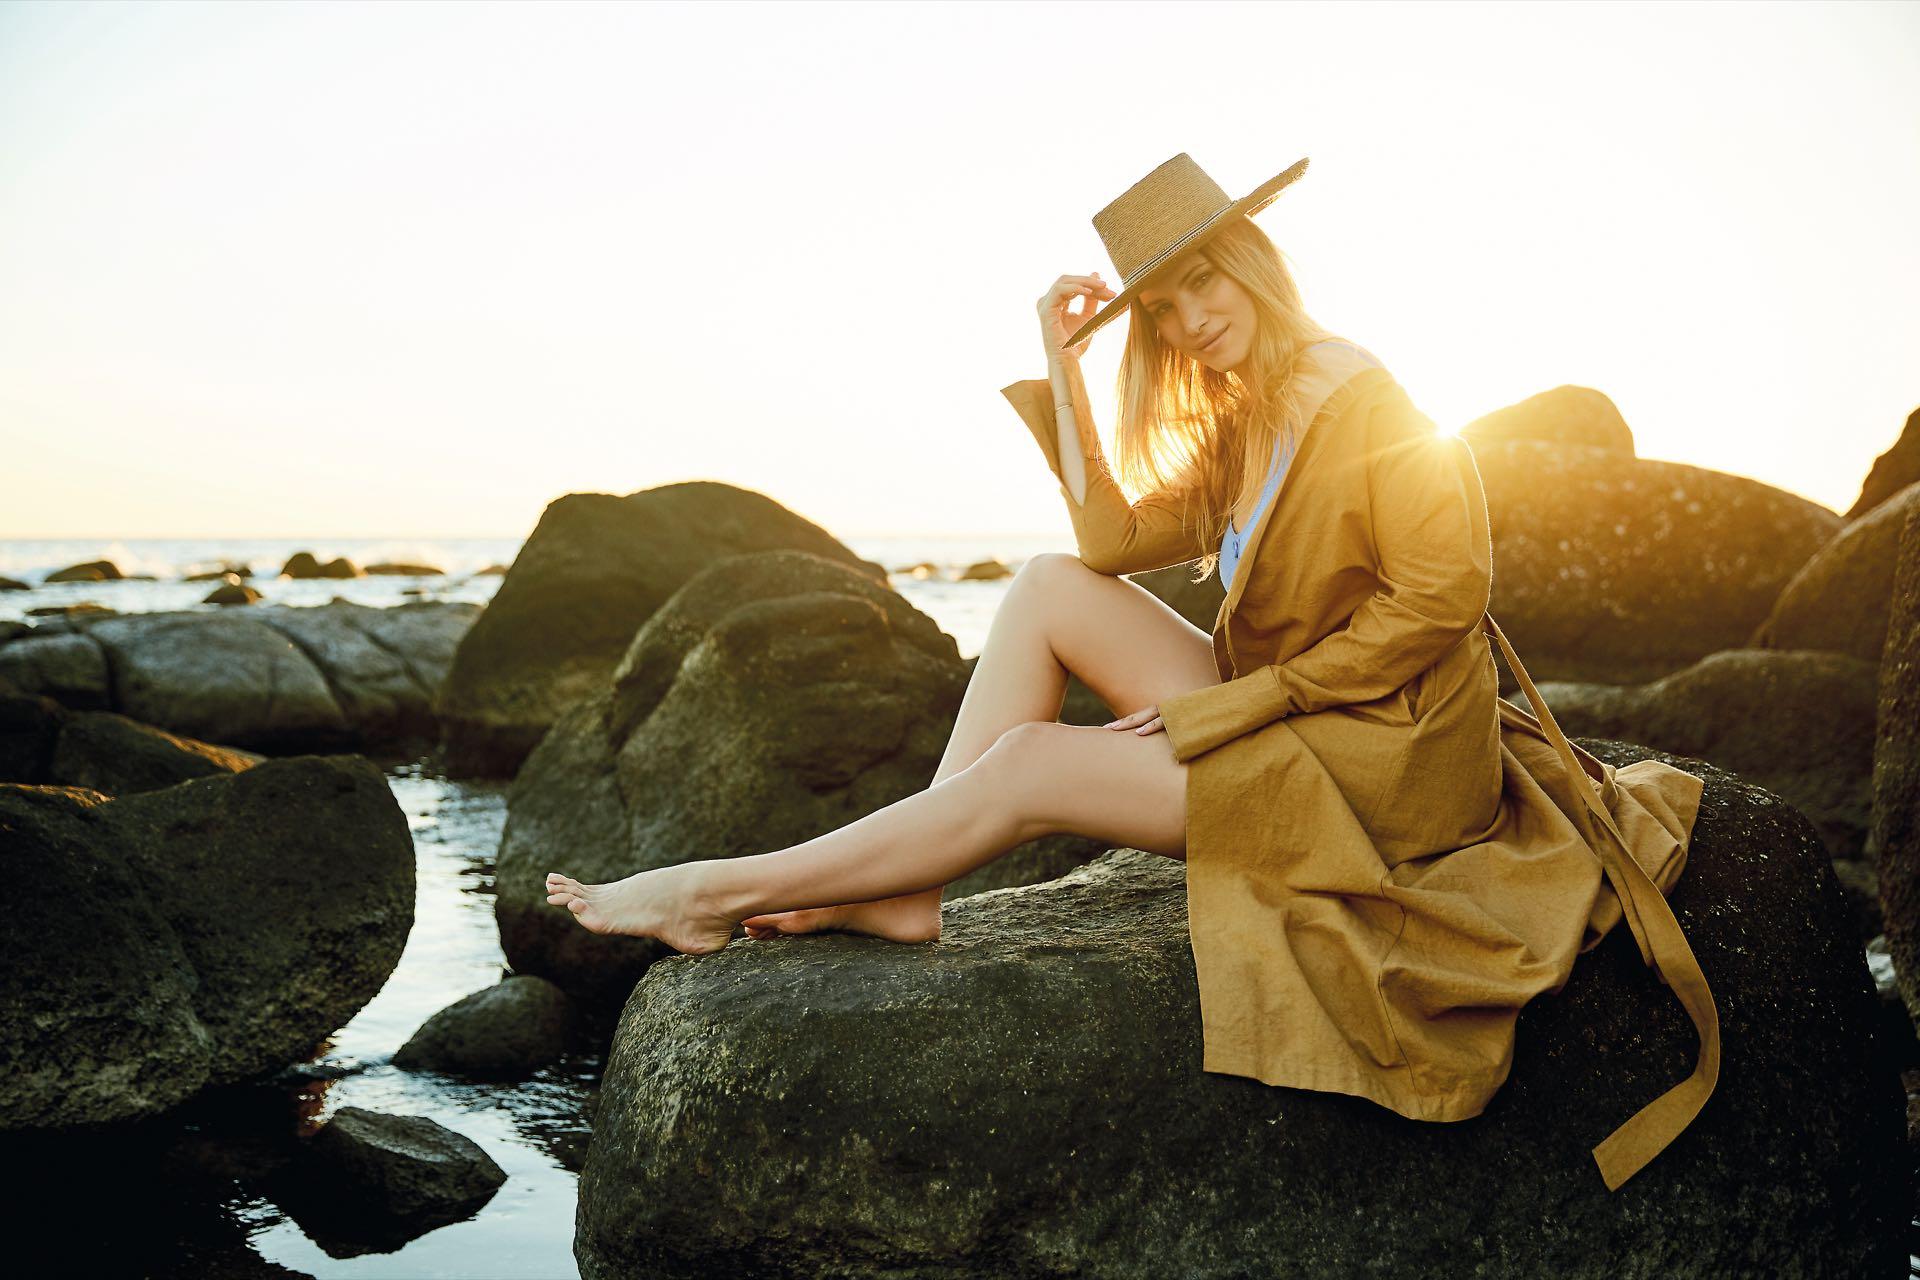 Soledad Ainesa en el sunset, postal imperdible de Punta del Este. Foto Raúl de Chapeaurouge/Para Ti.